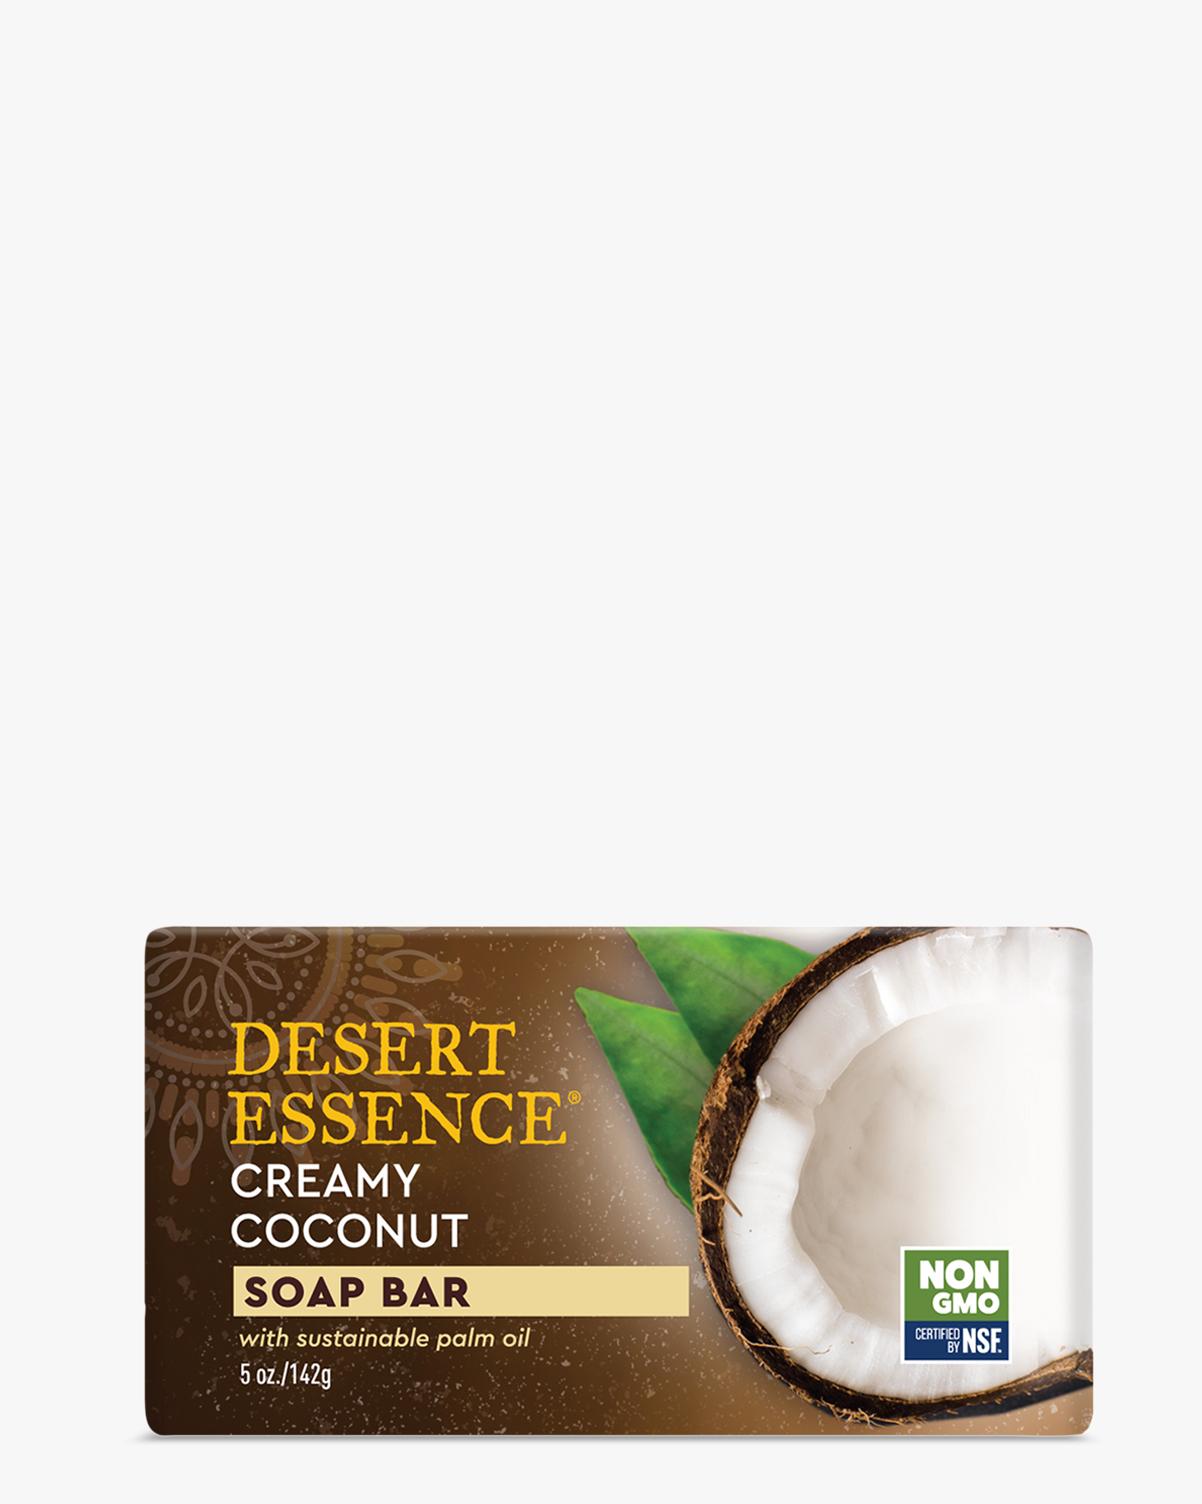 Desert Essence coupon: Desert Essence Creamy Coconut Soap Bar, 5 oz. | Vegan | Gluten-Free